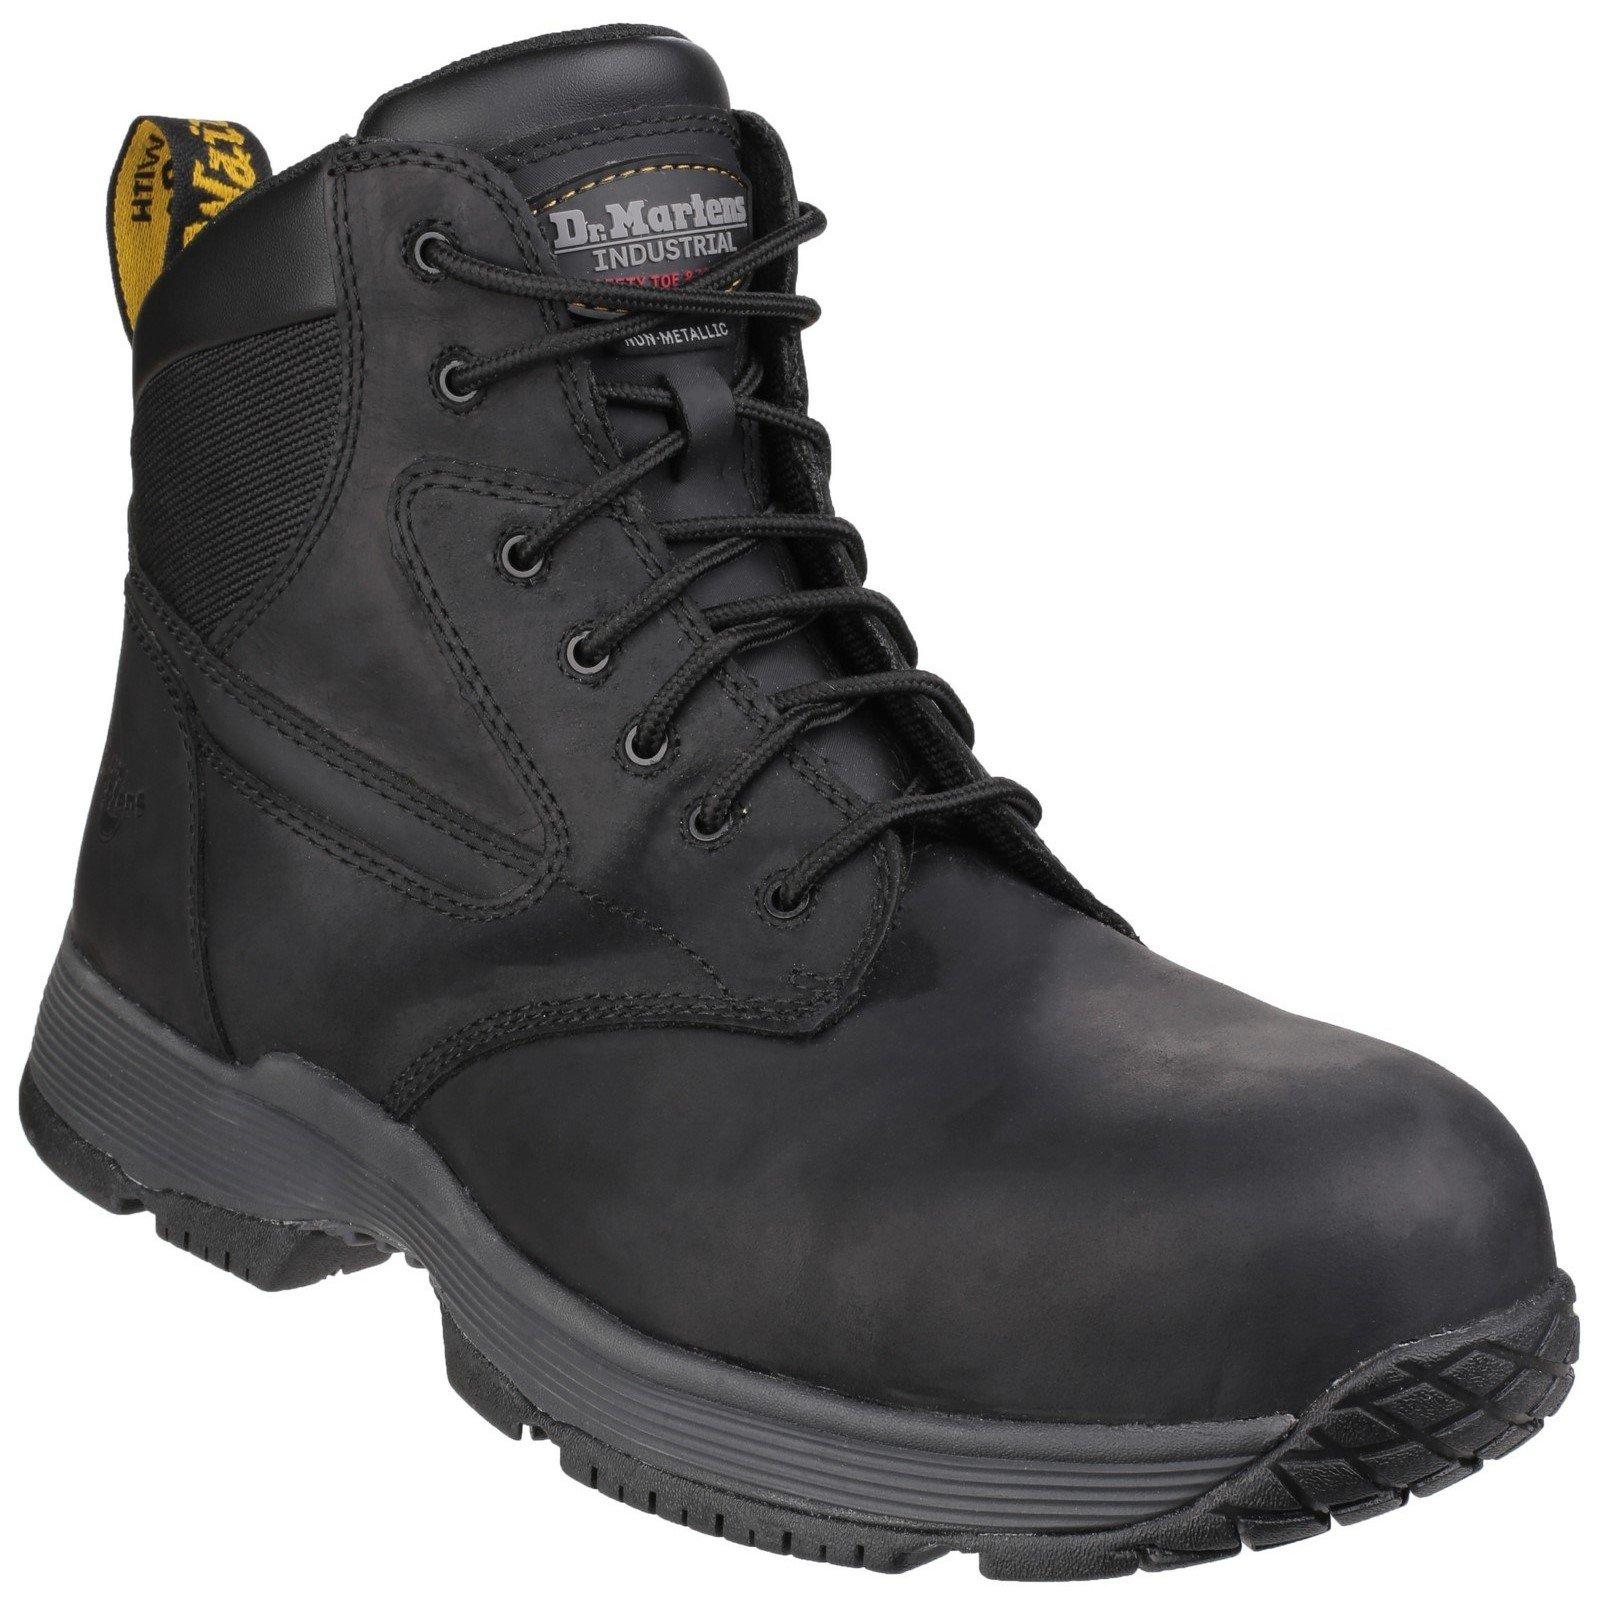 Dr Martens Unisex Corvid Composite Lace up Safety Boot Black 24862-41125 - Black 7